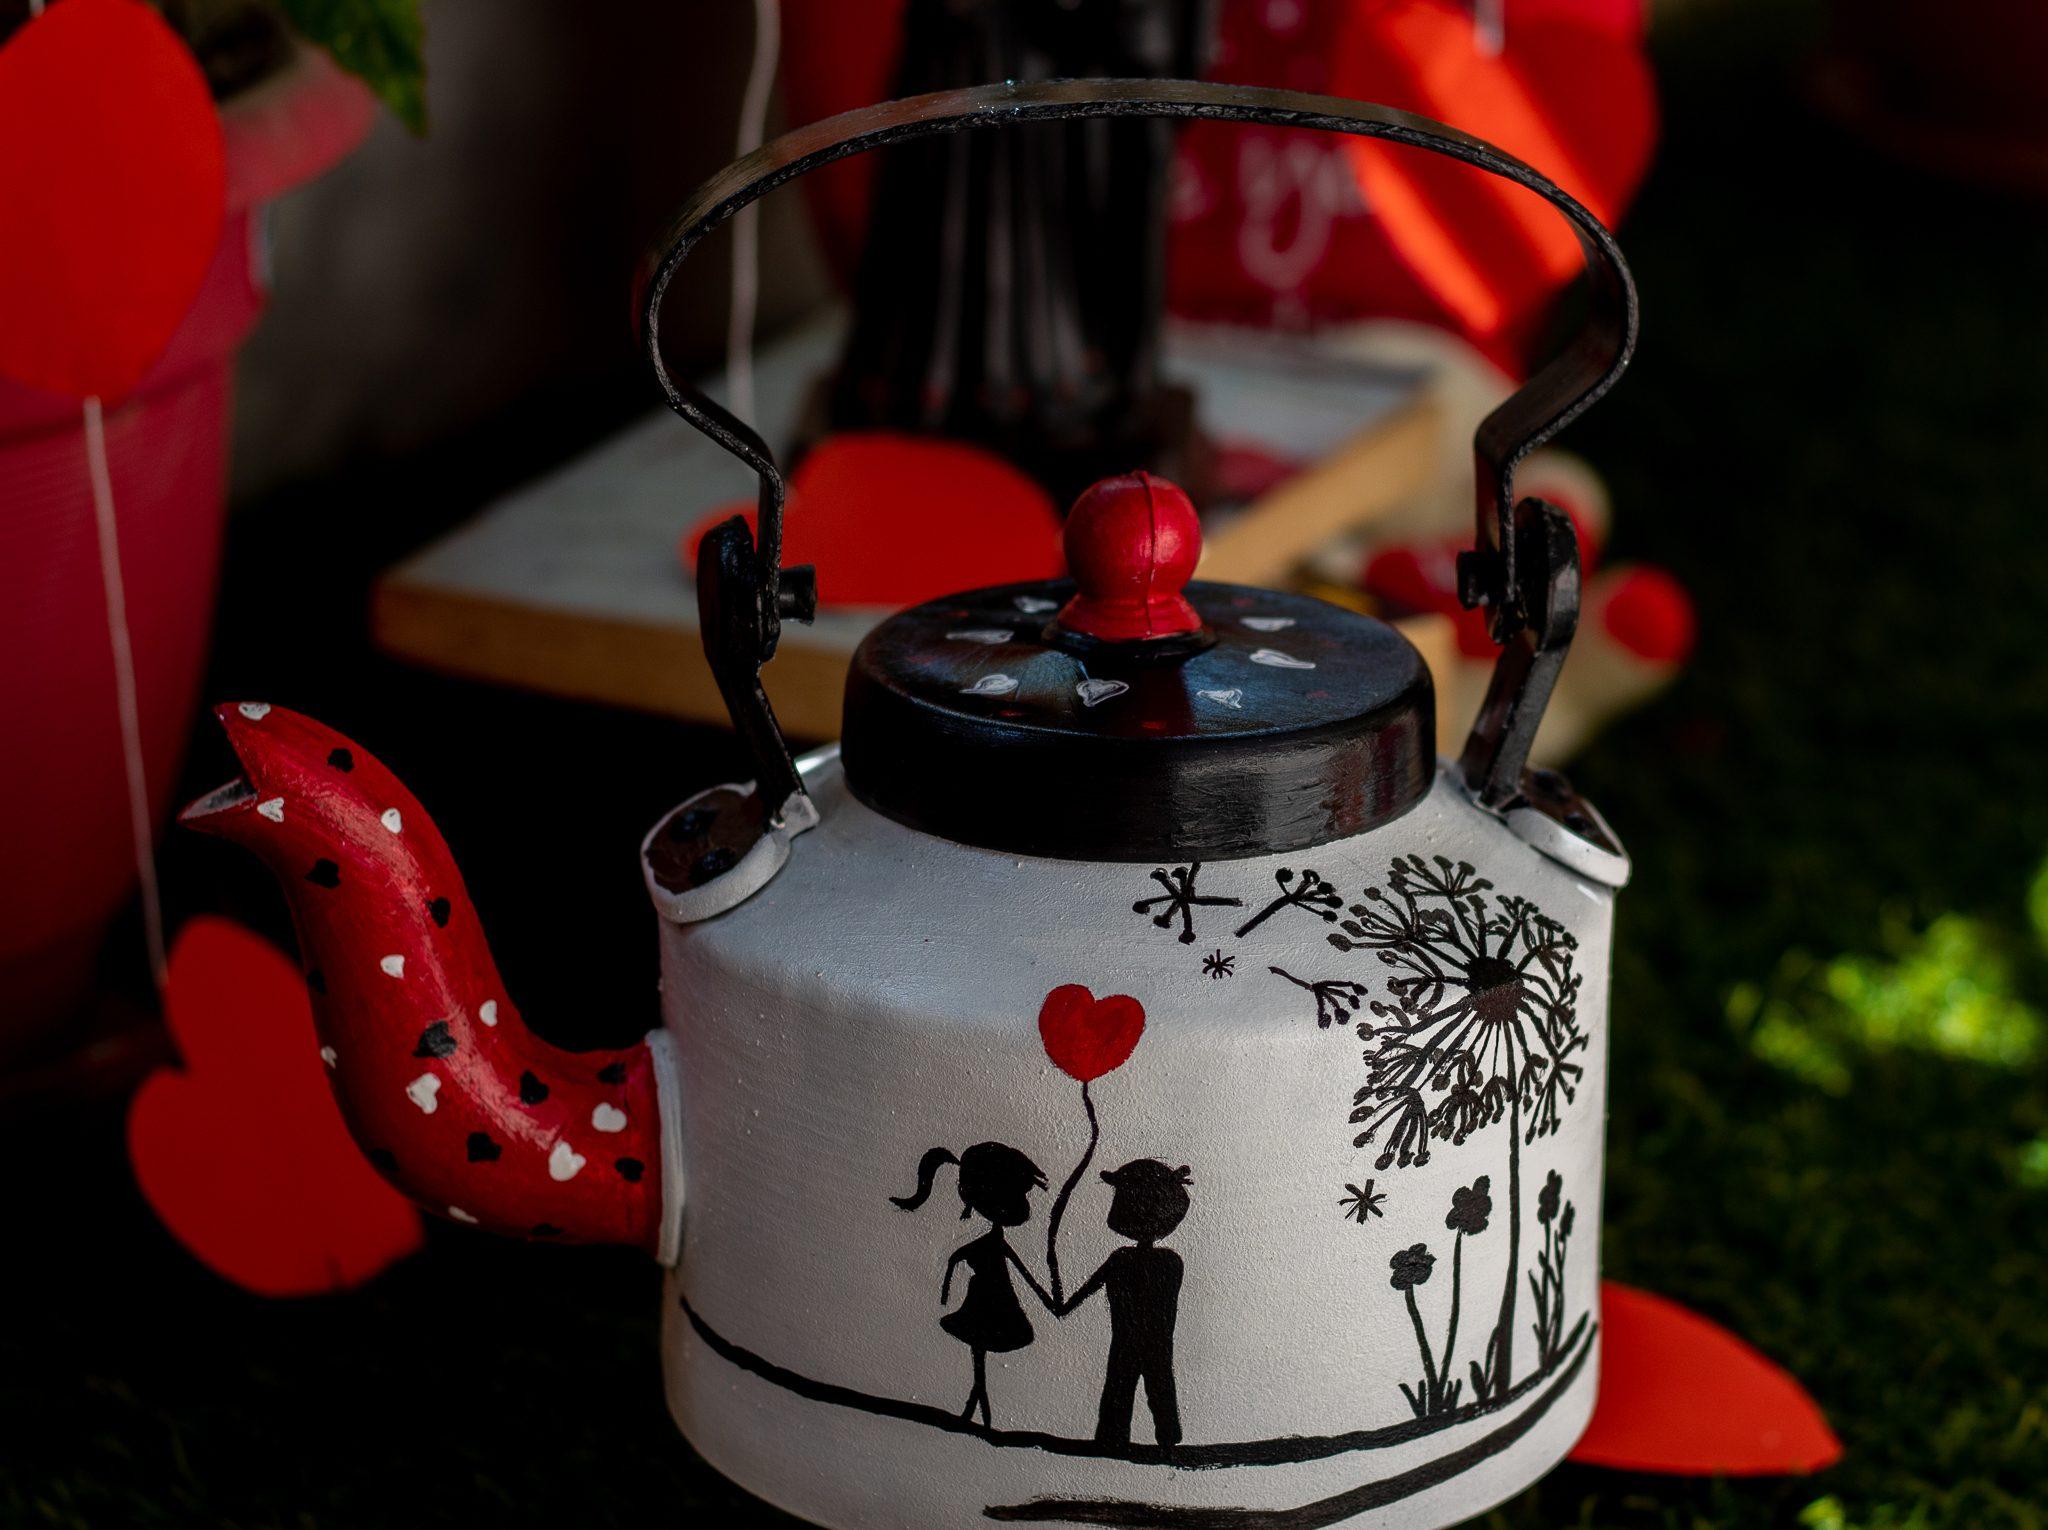 Creative Corner Love themed Hand painted decorative Kettle  Love themed Handpainted Kettle